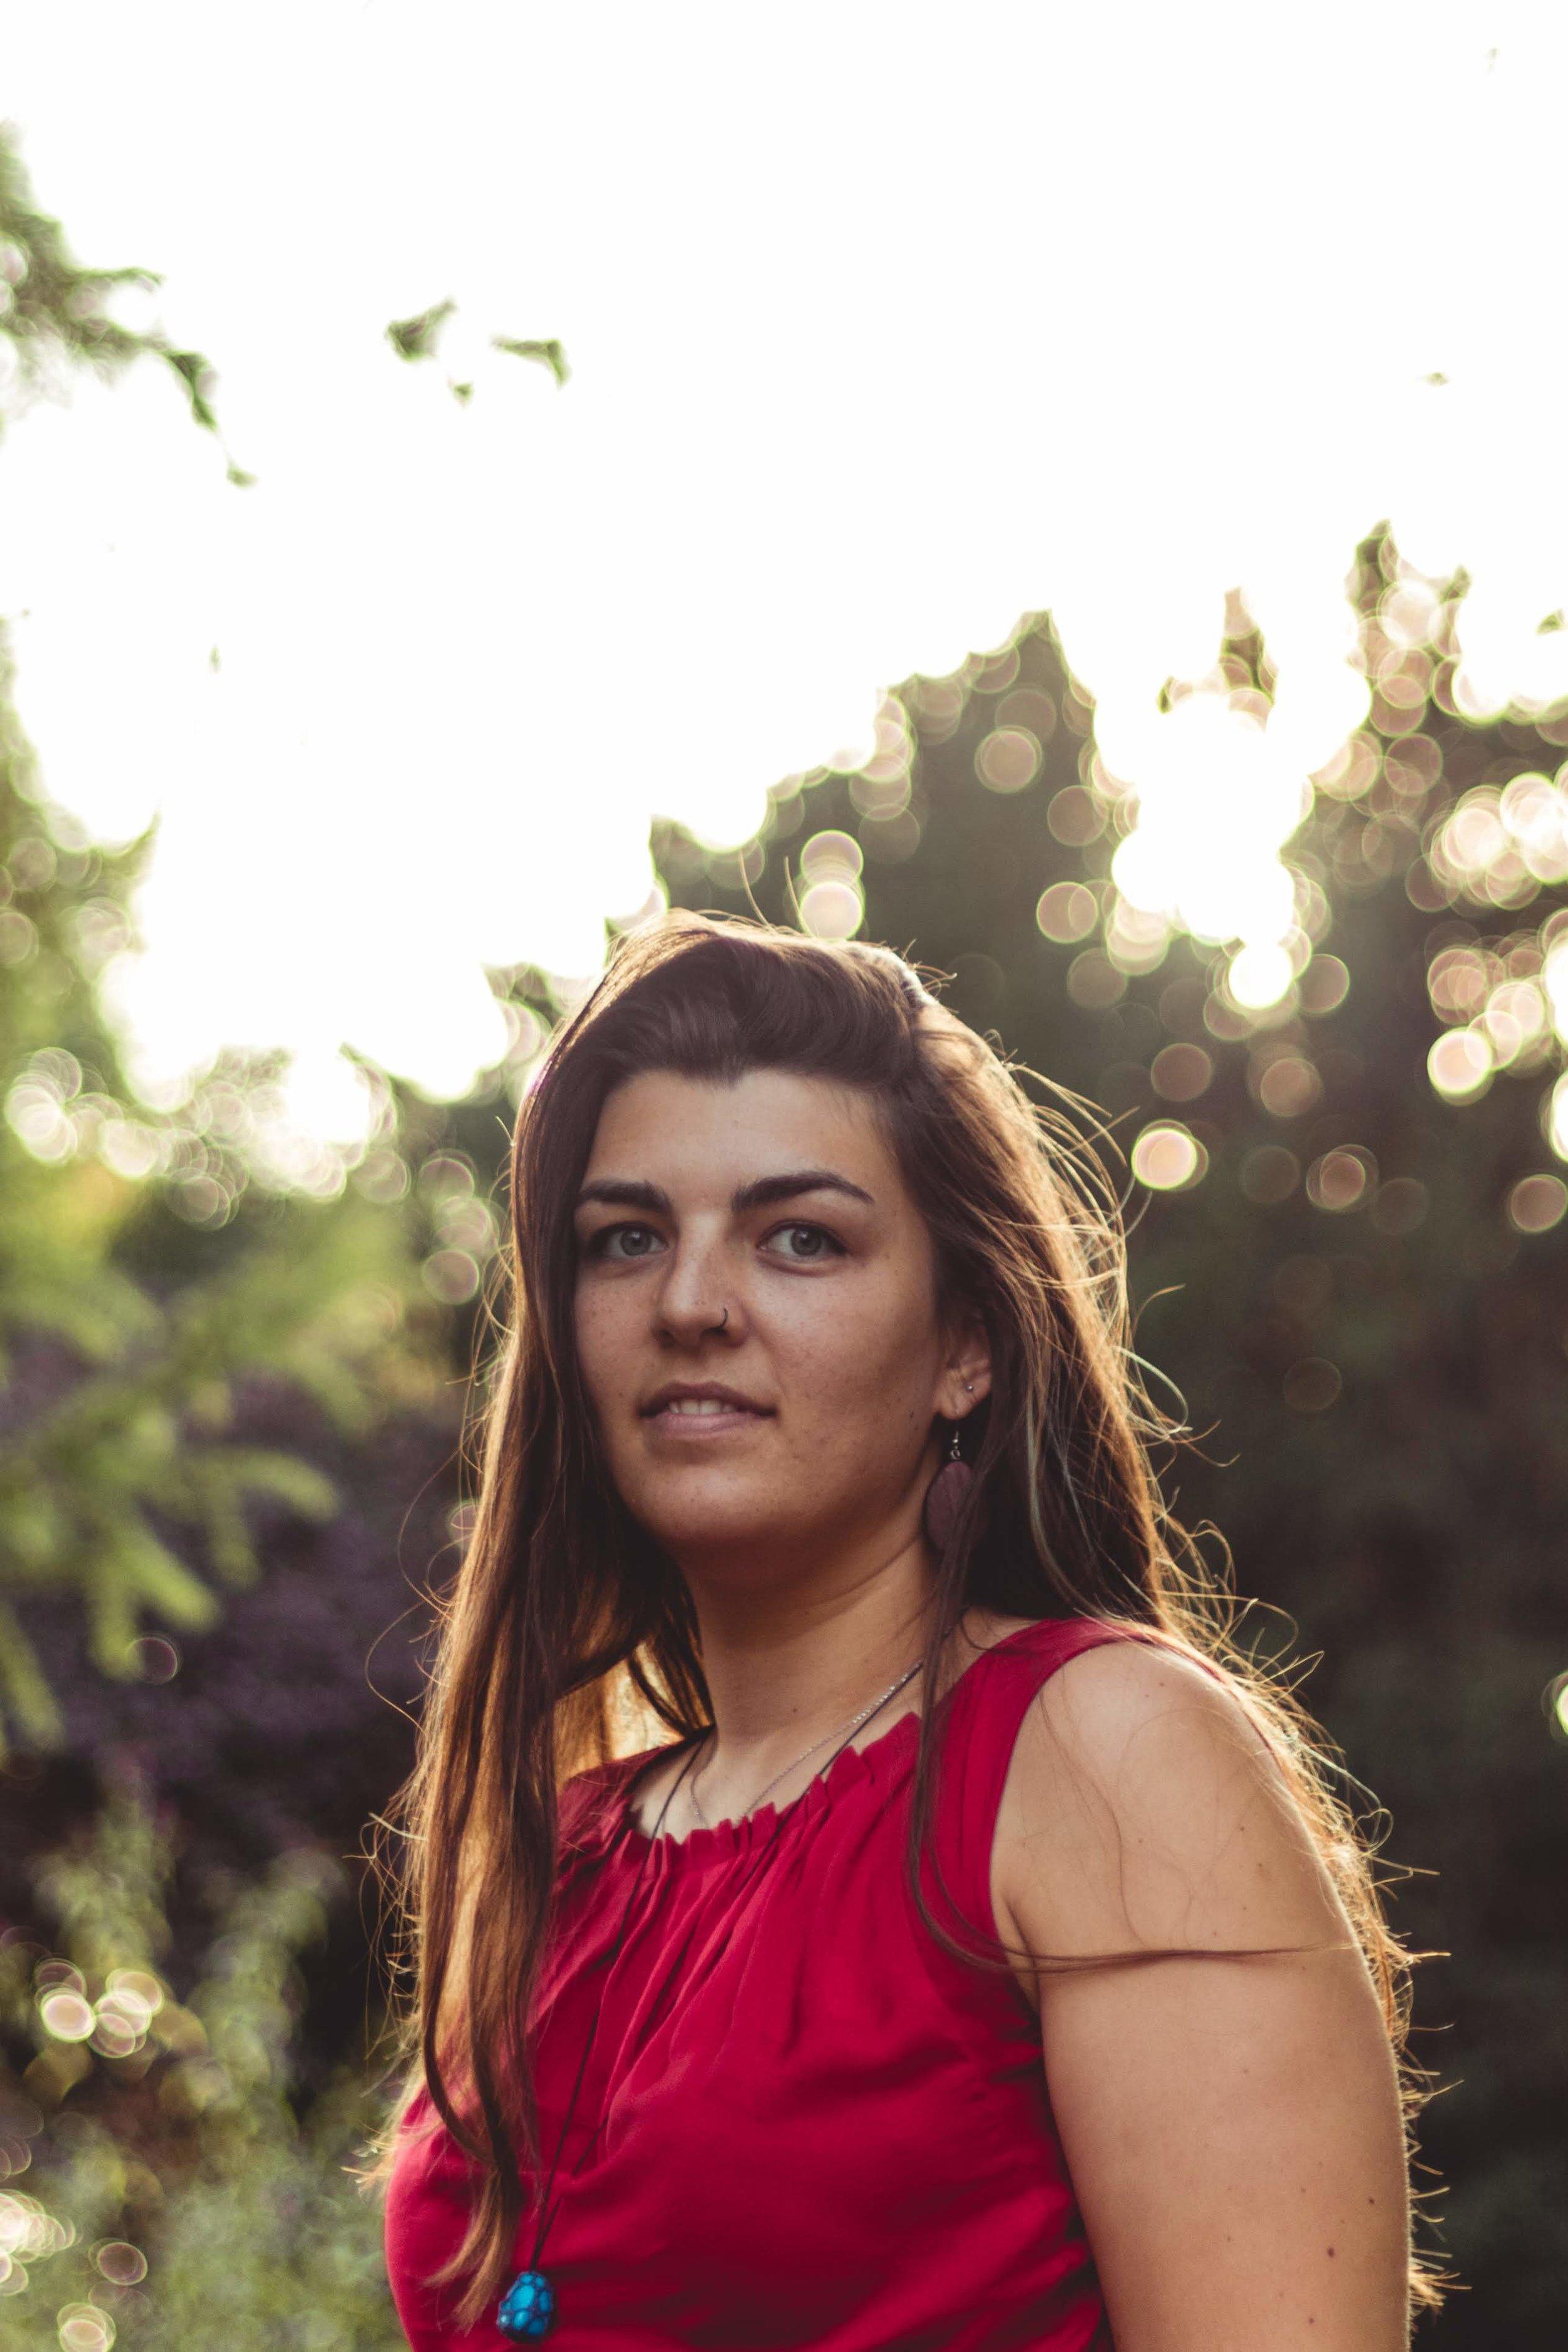 Portrait Session - Model : Minne Marlo